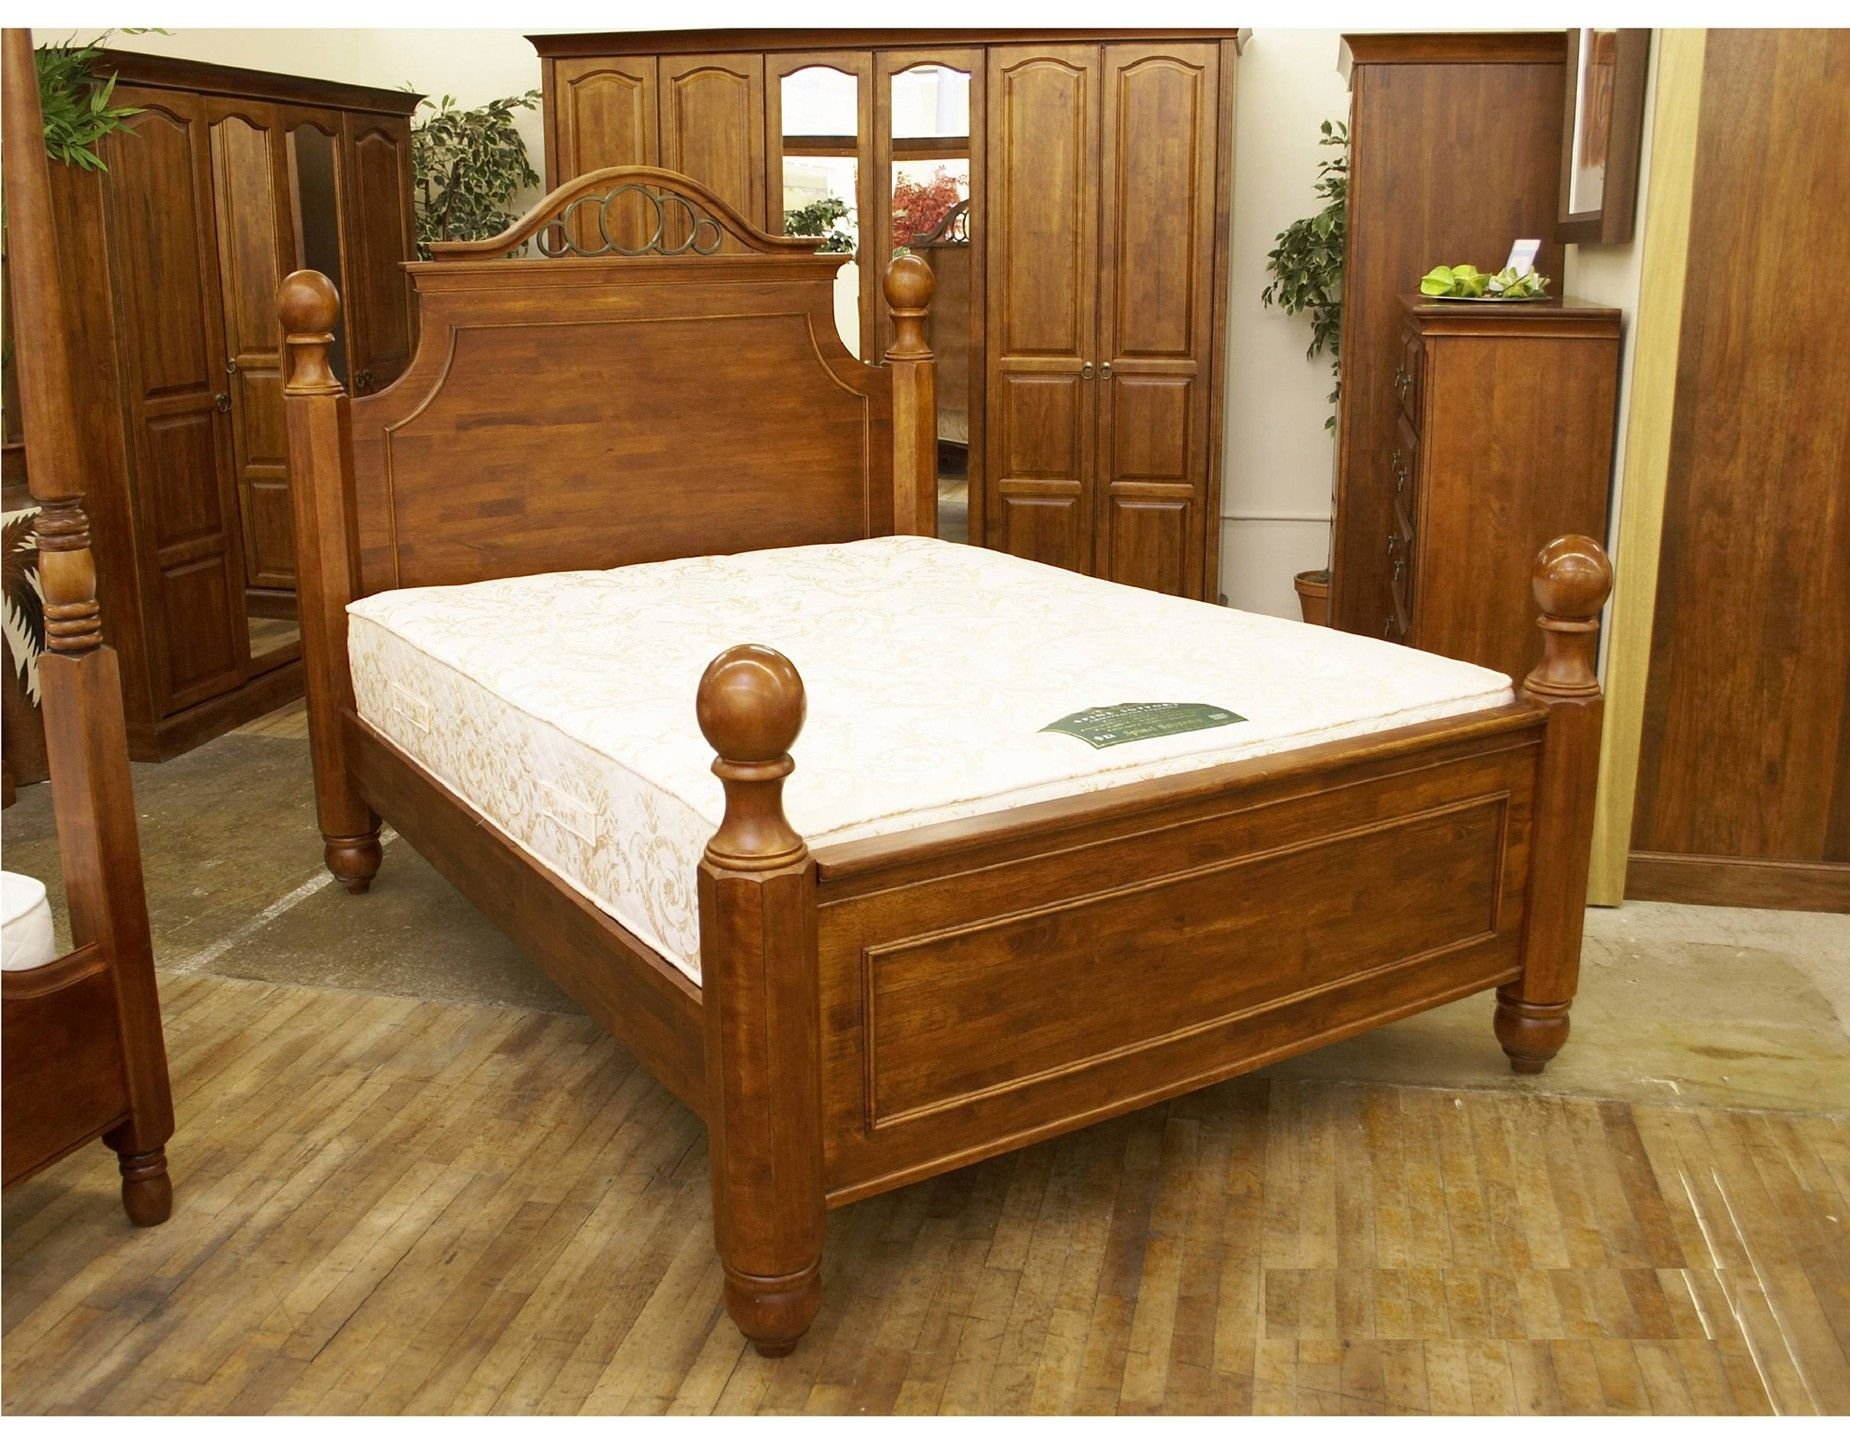 Rustic Bedroom 2015 21 Rustic Bedroom Interior Design Ideas